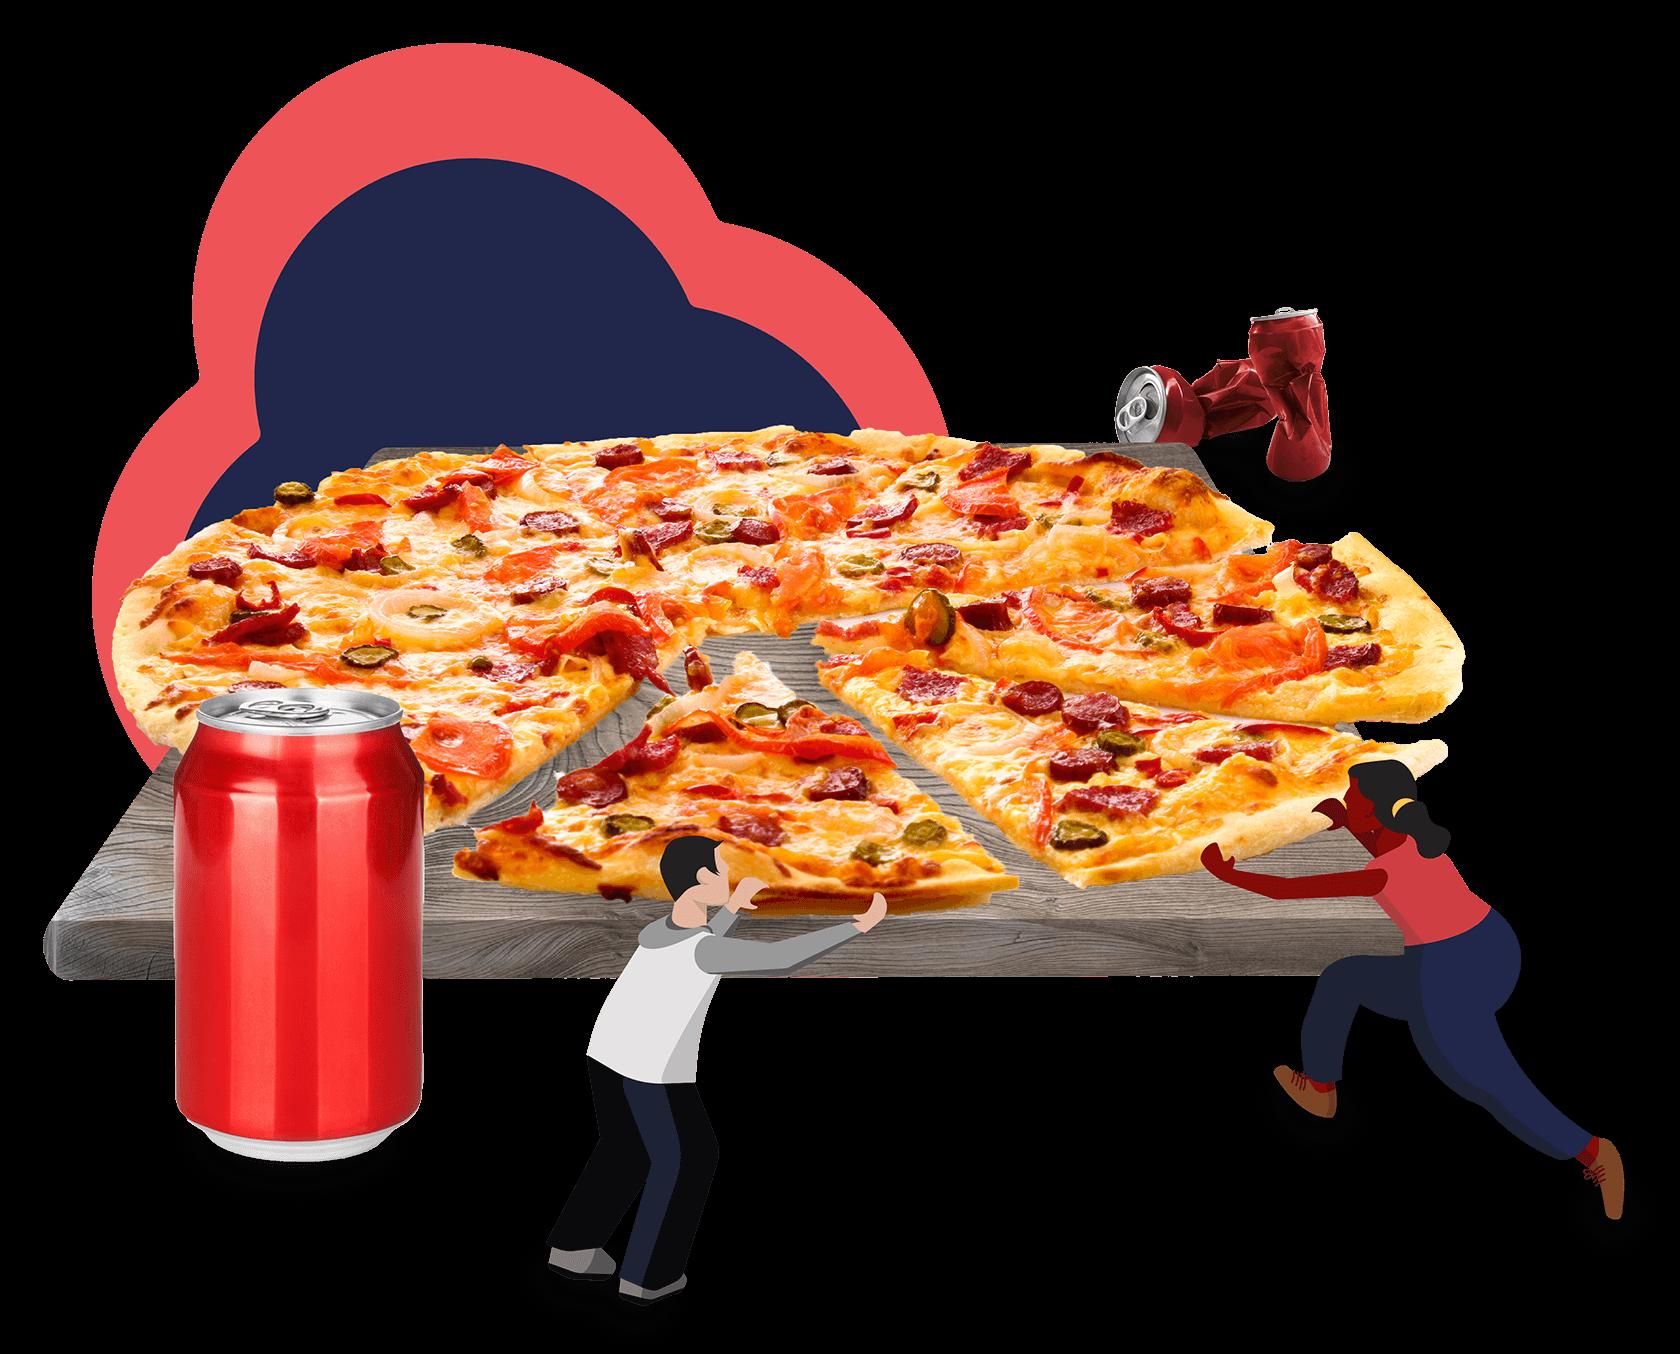 Illustration of people splitting a pizza